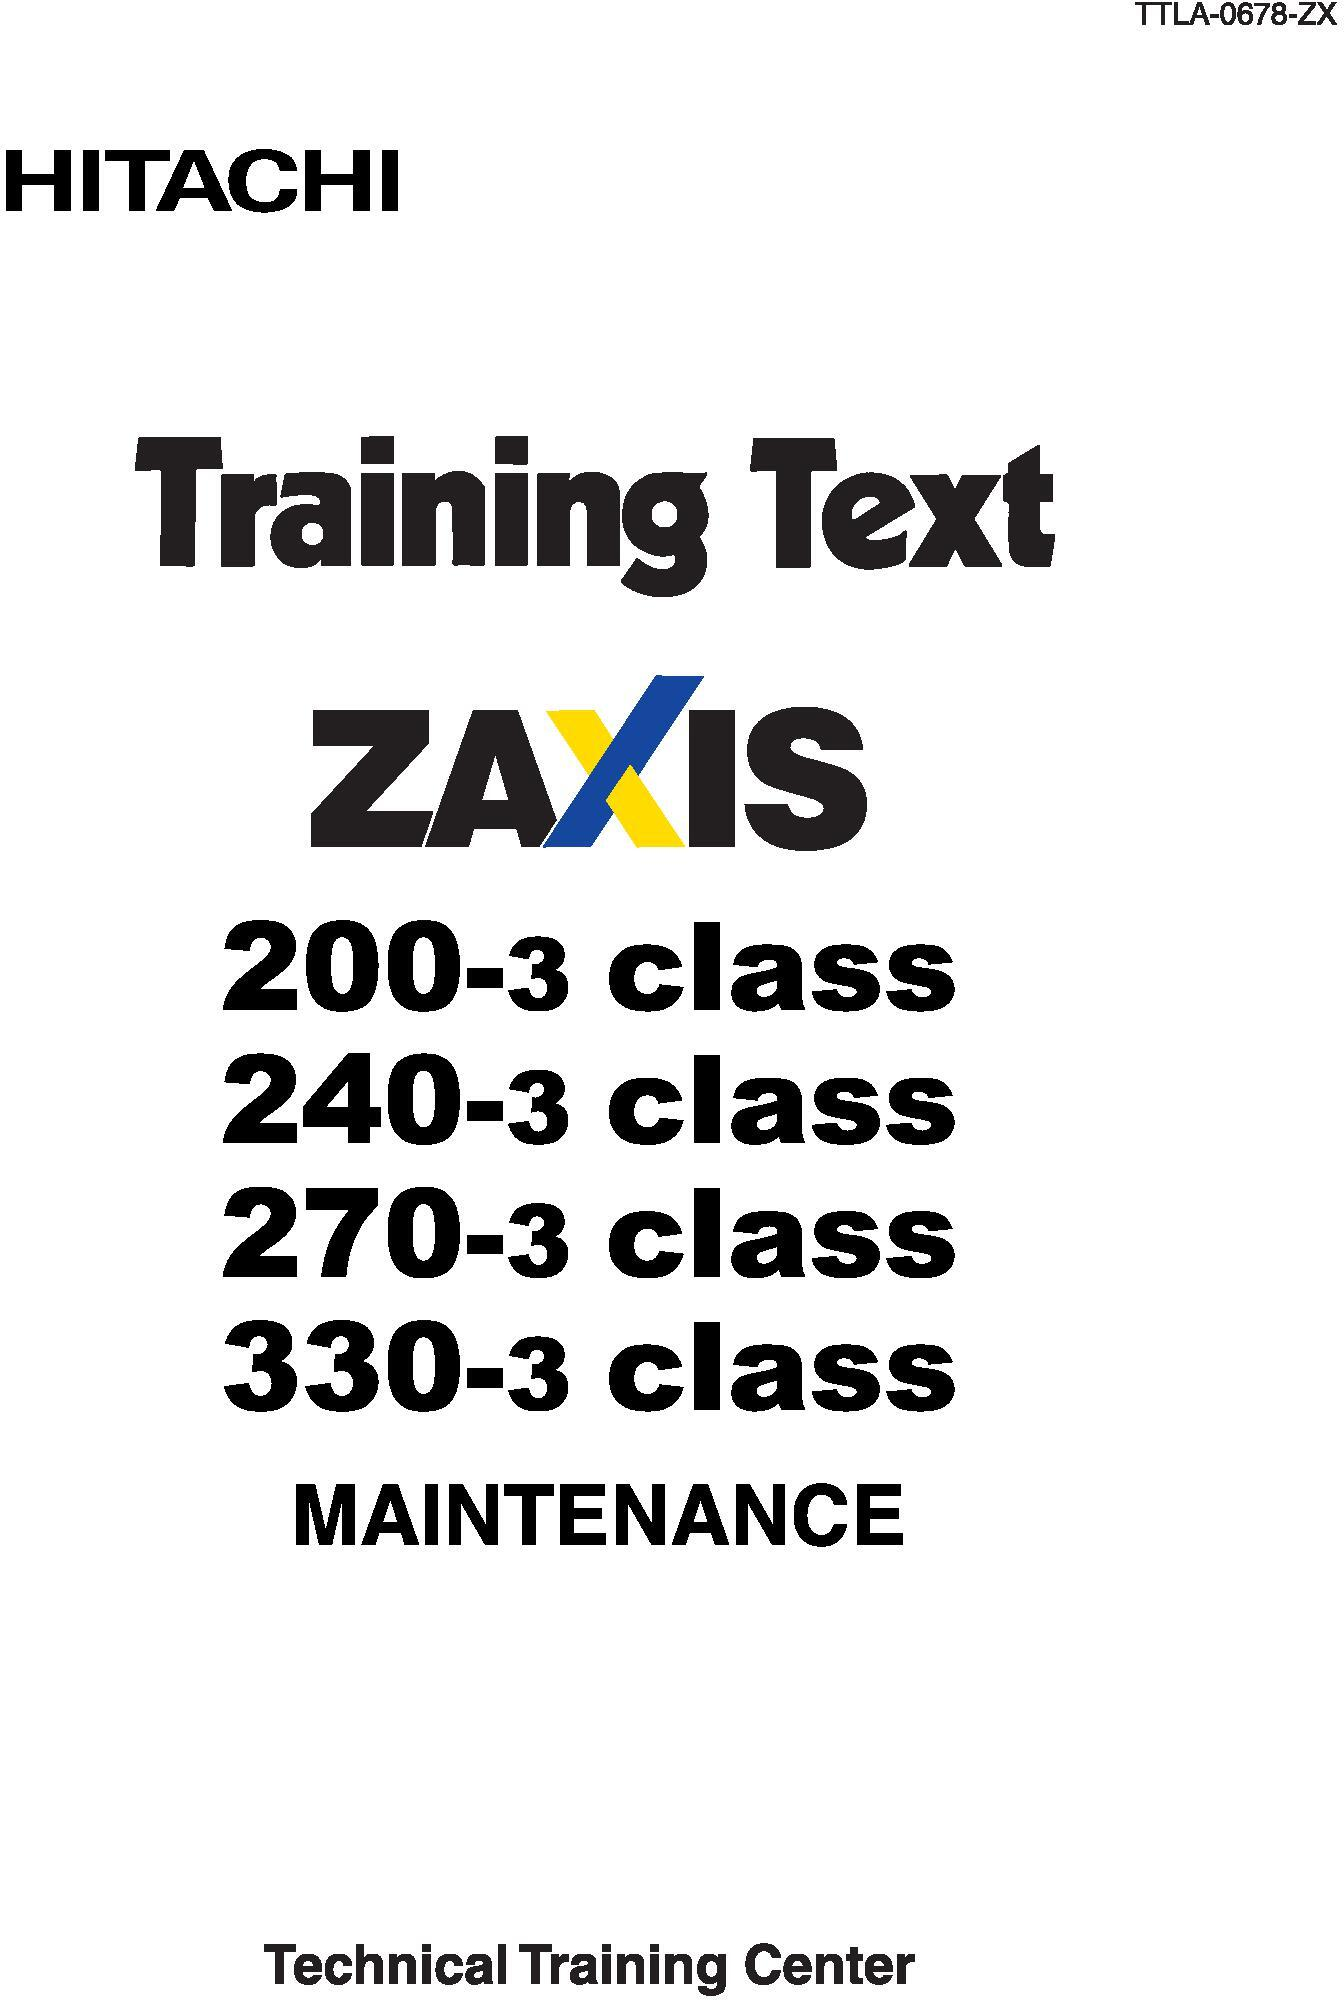 Hitachi Zaxis 200-3, 210-3, 225-3, 240-3, 250-3, 270-3